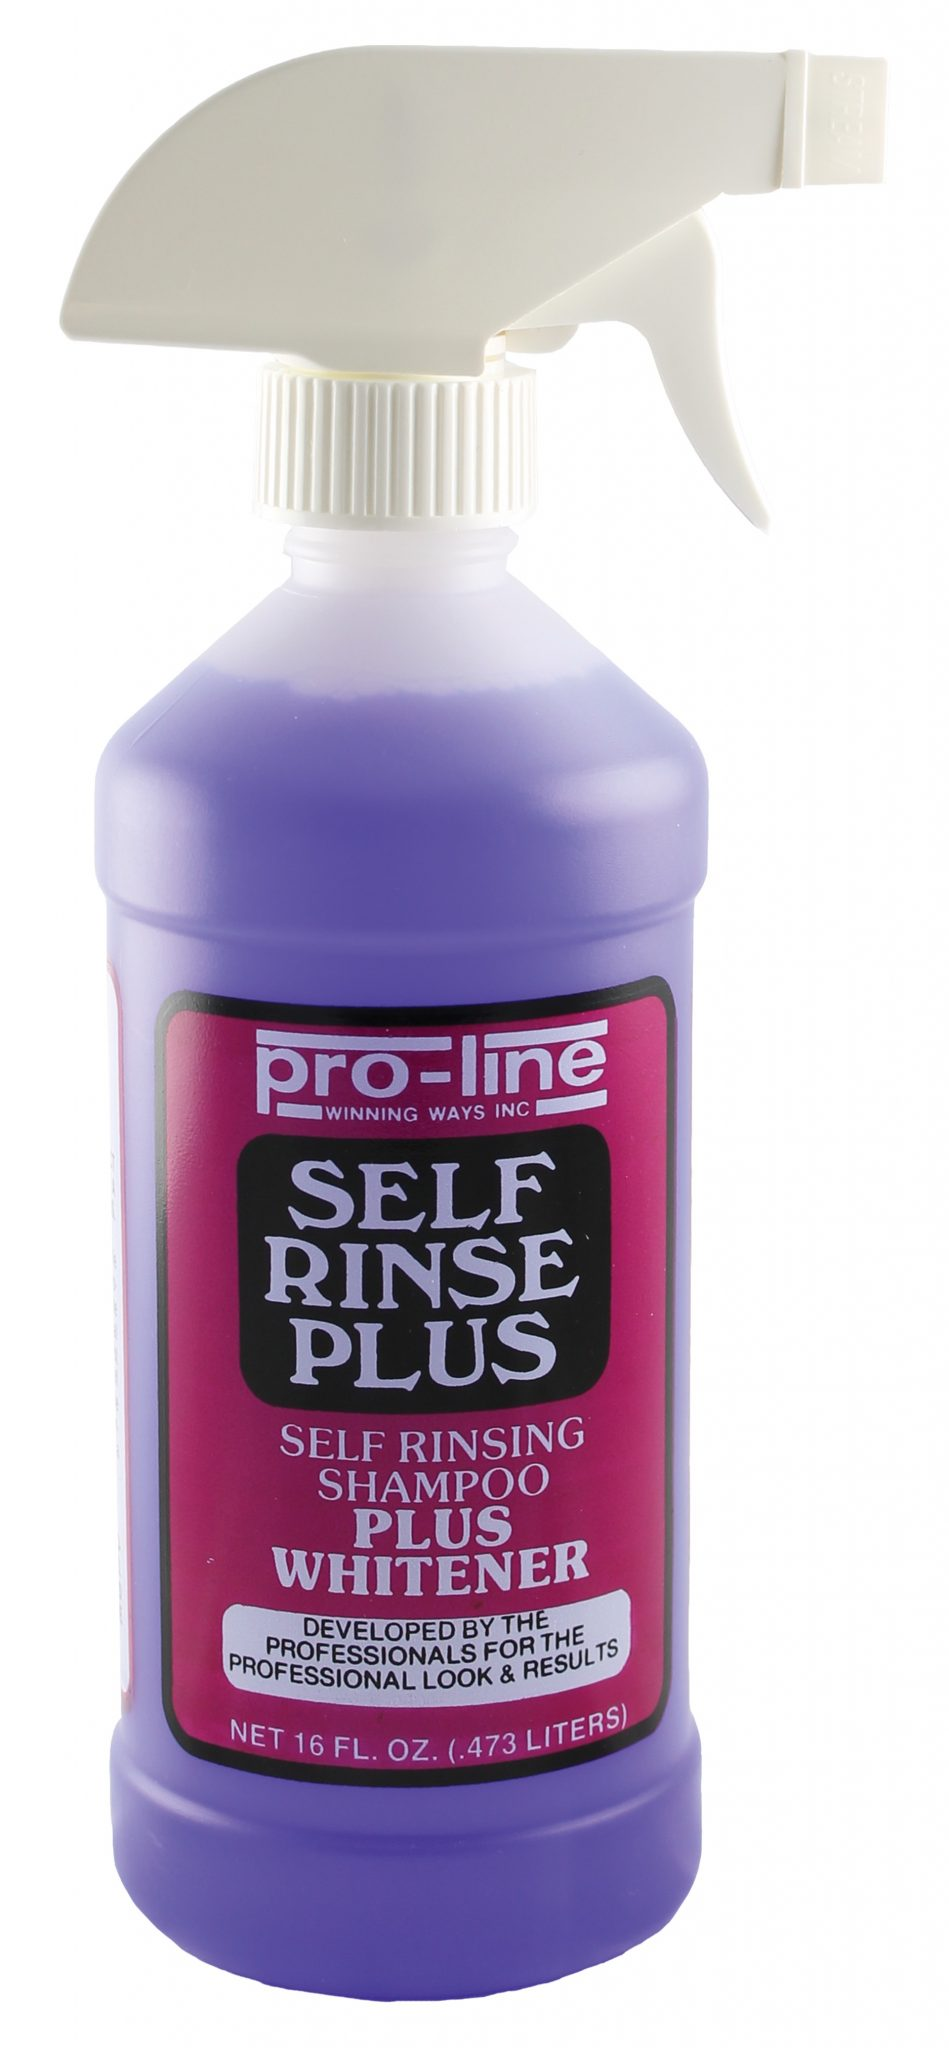 Tør Shampoo til hunde fra PRO-LINE